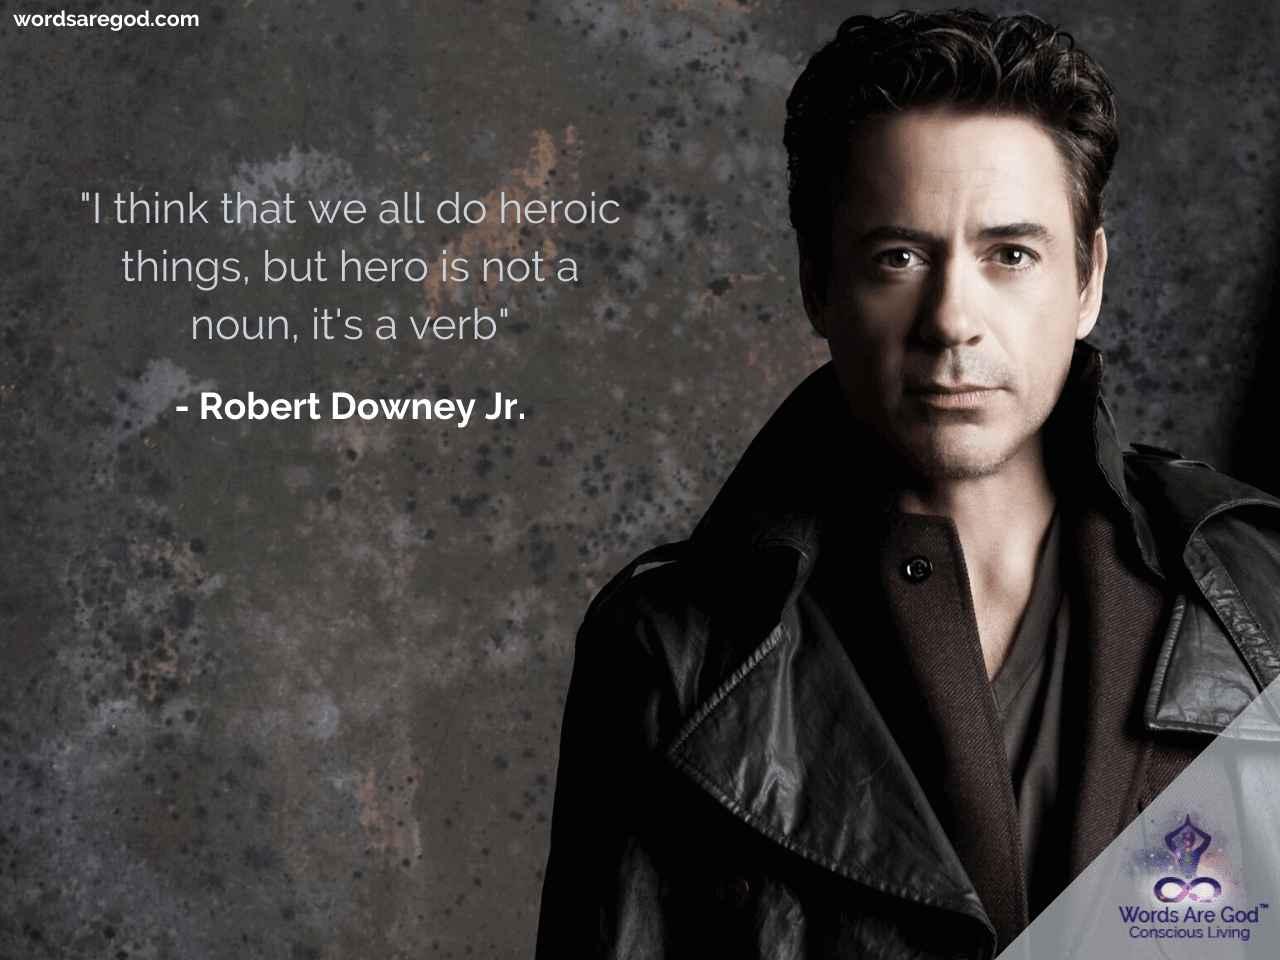 Robert Downey Jr. Inspirational Quote by Robert Downey Jr.